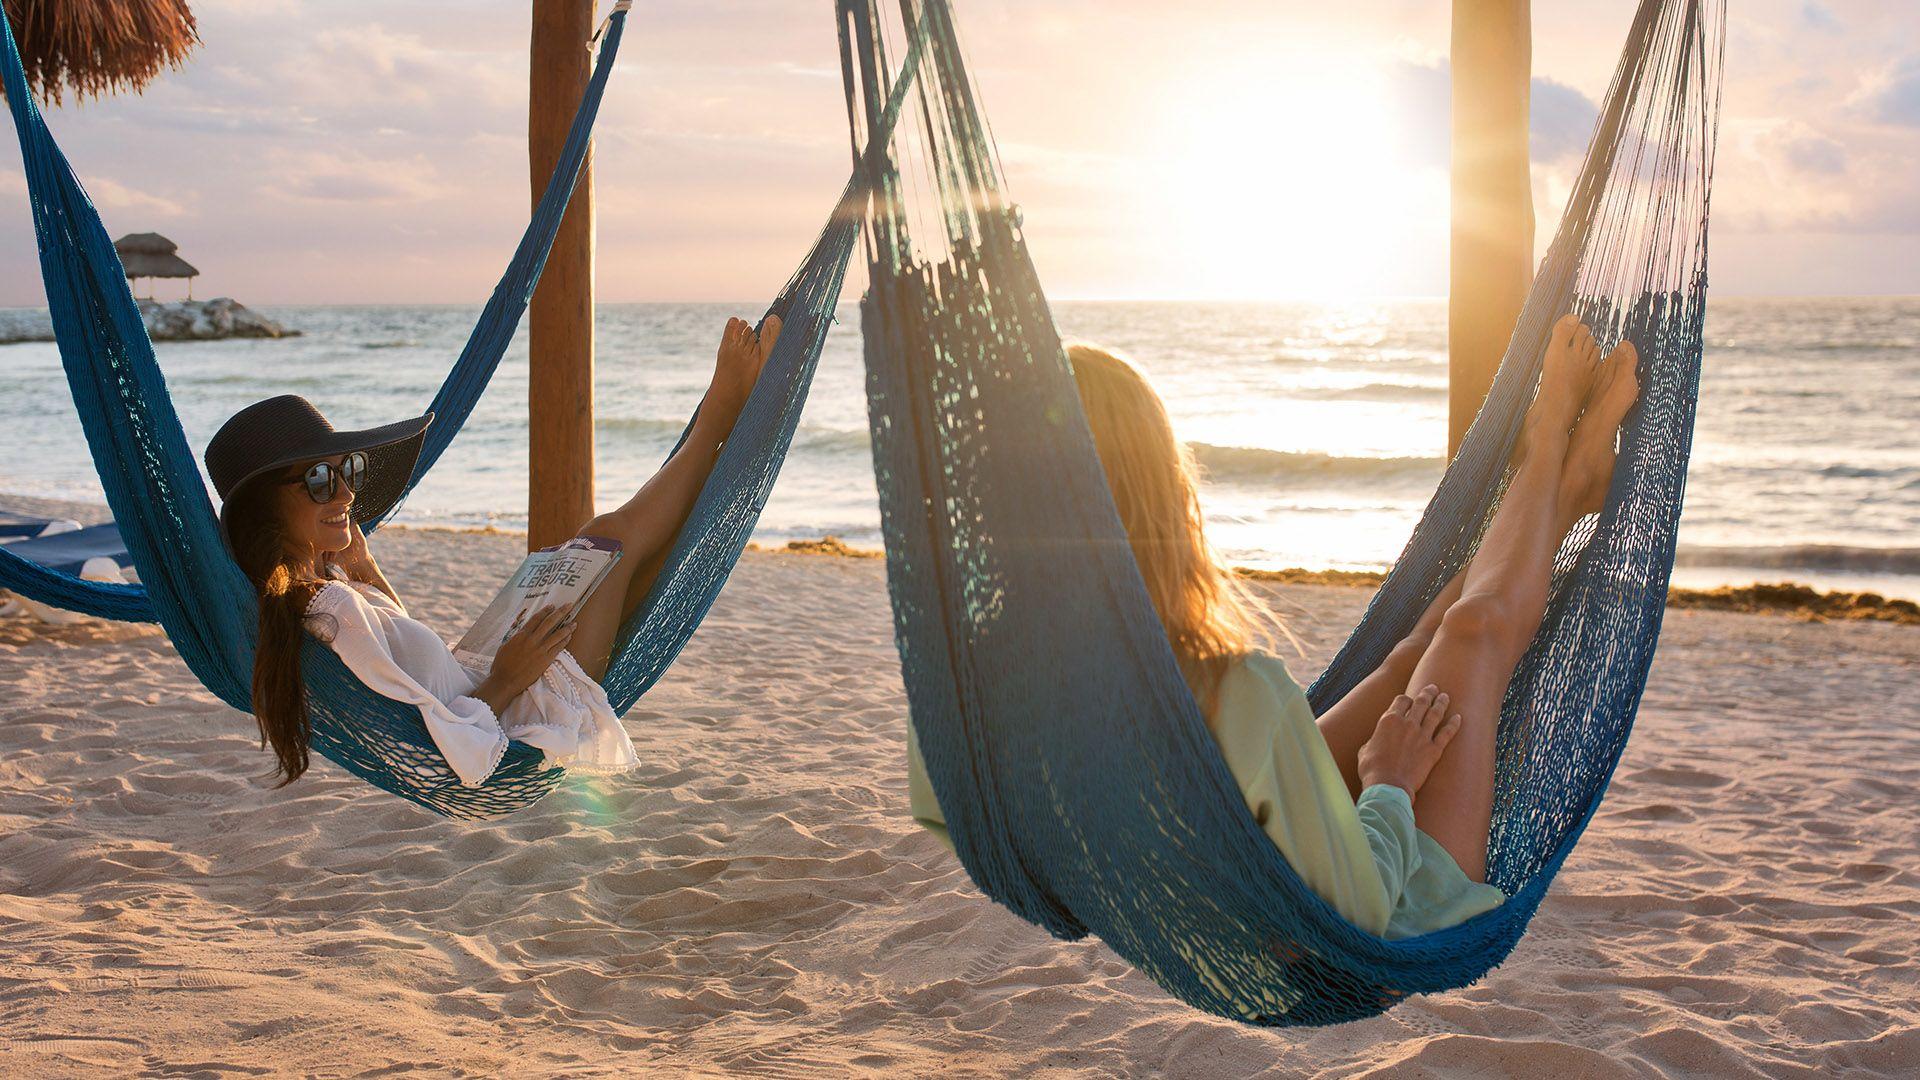 Women in hammocks   Mexico Cruising Guide   Snag-A-Slip